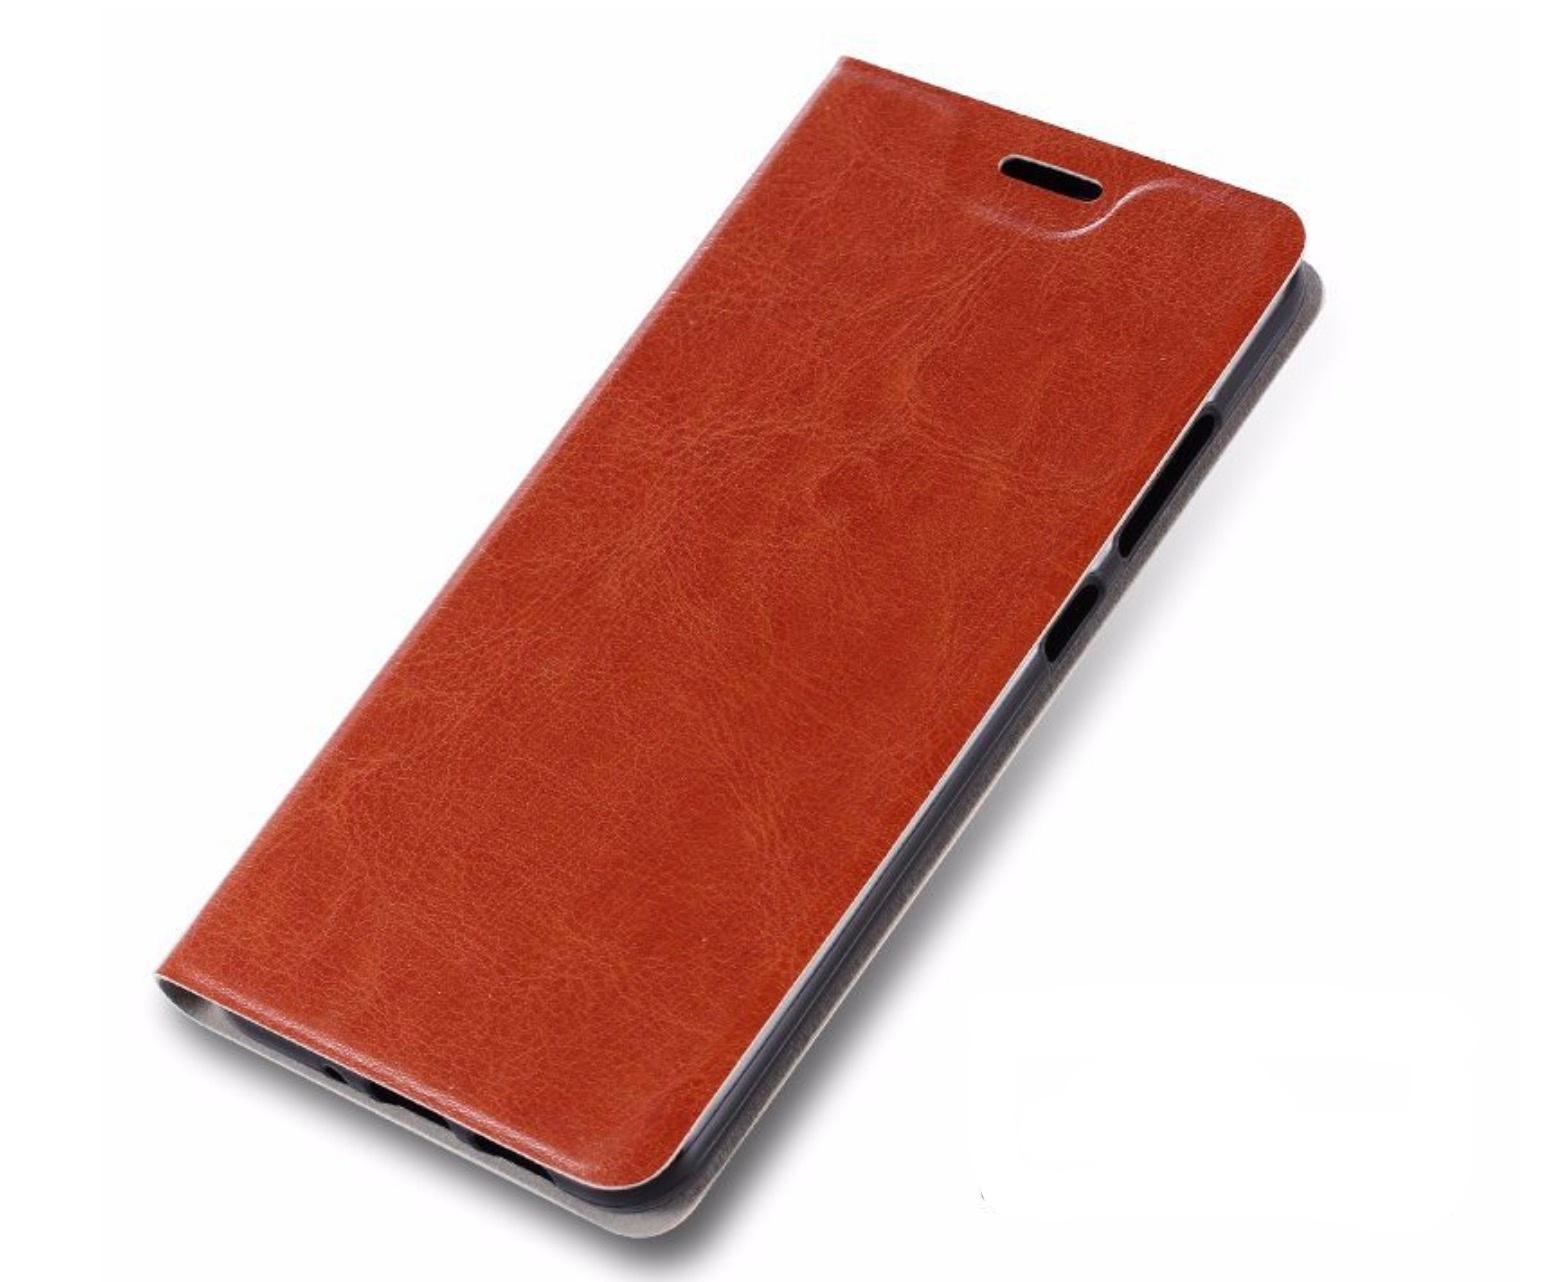 Чехол-книжка MyPads для Microsoft Lumia 640 на жёсткой металлической основе коричневый цена и фото